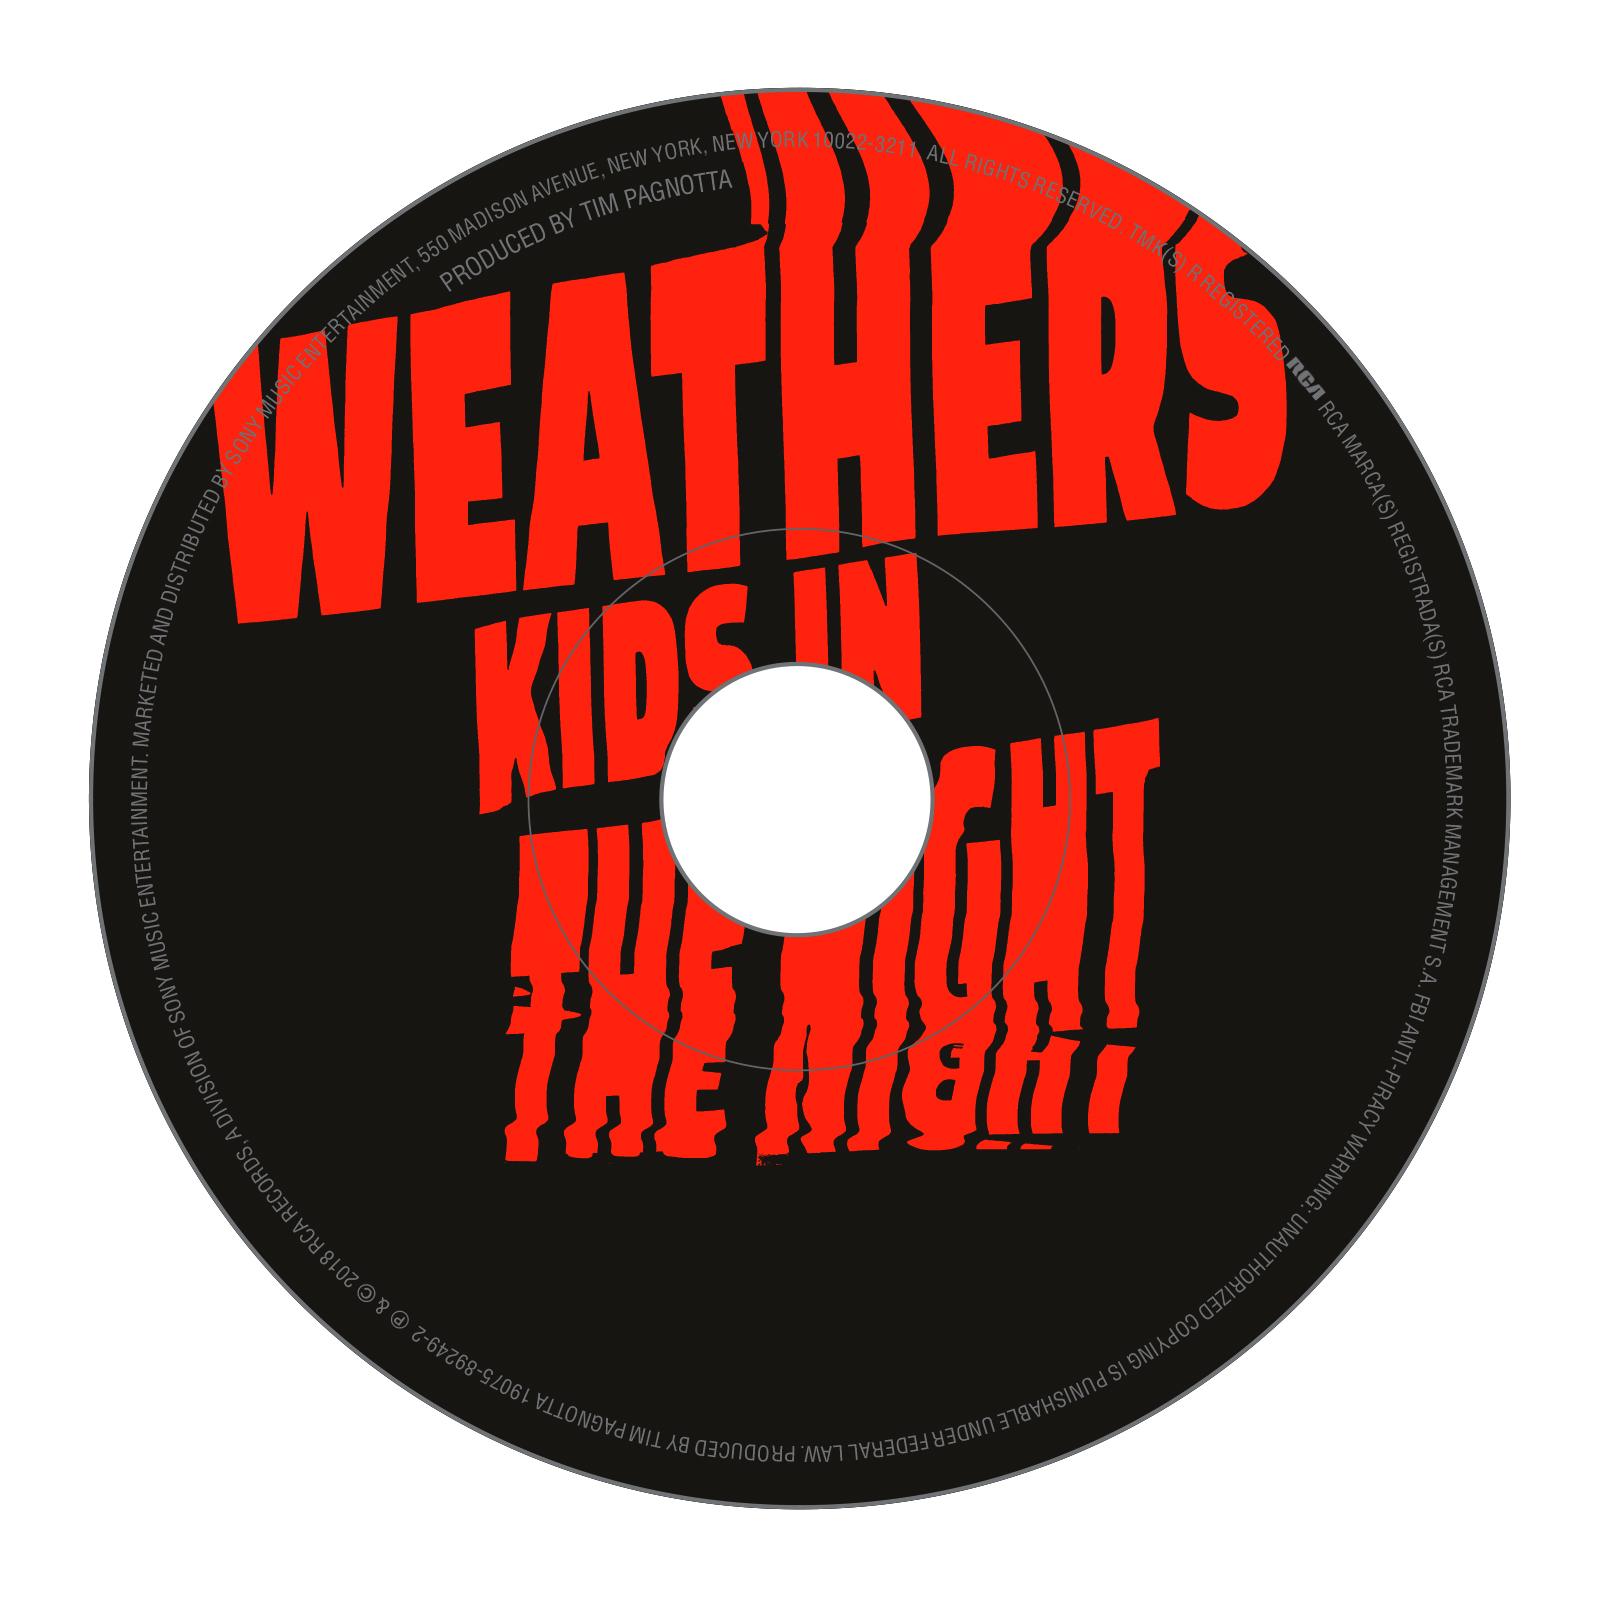 Weathers_CD_M1